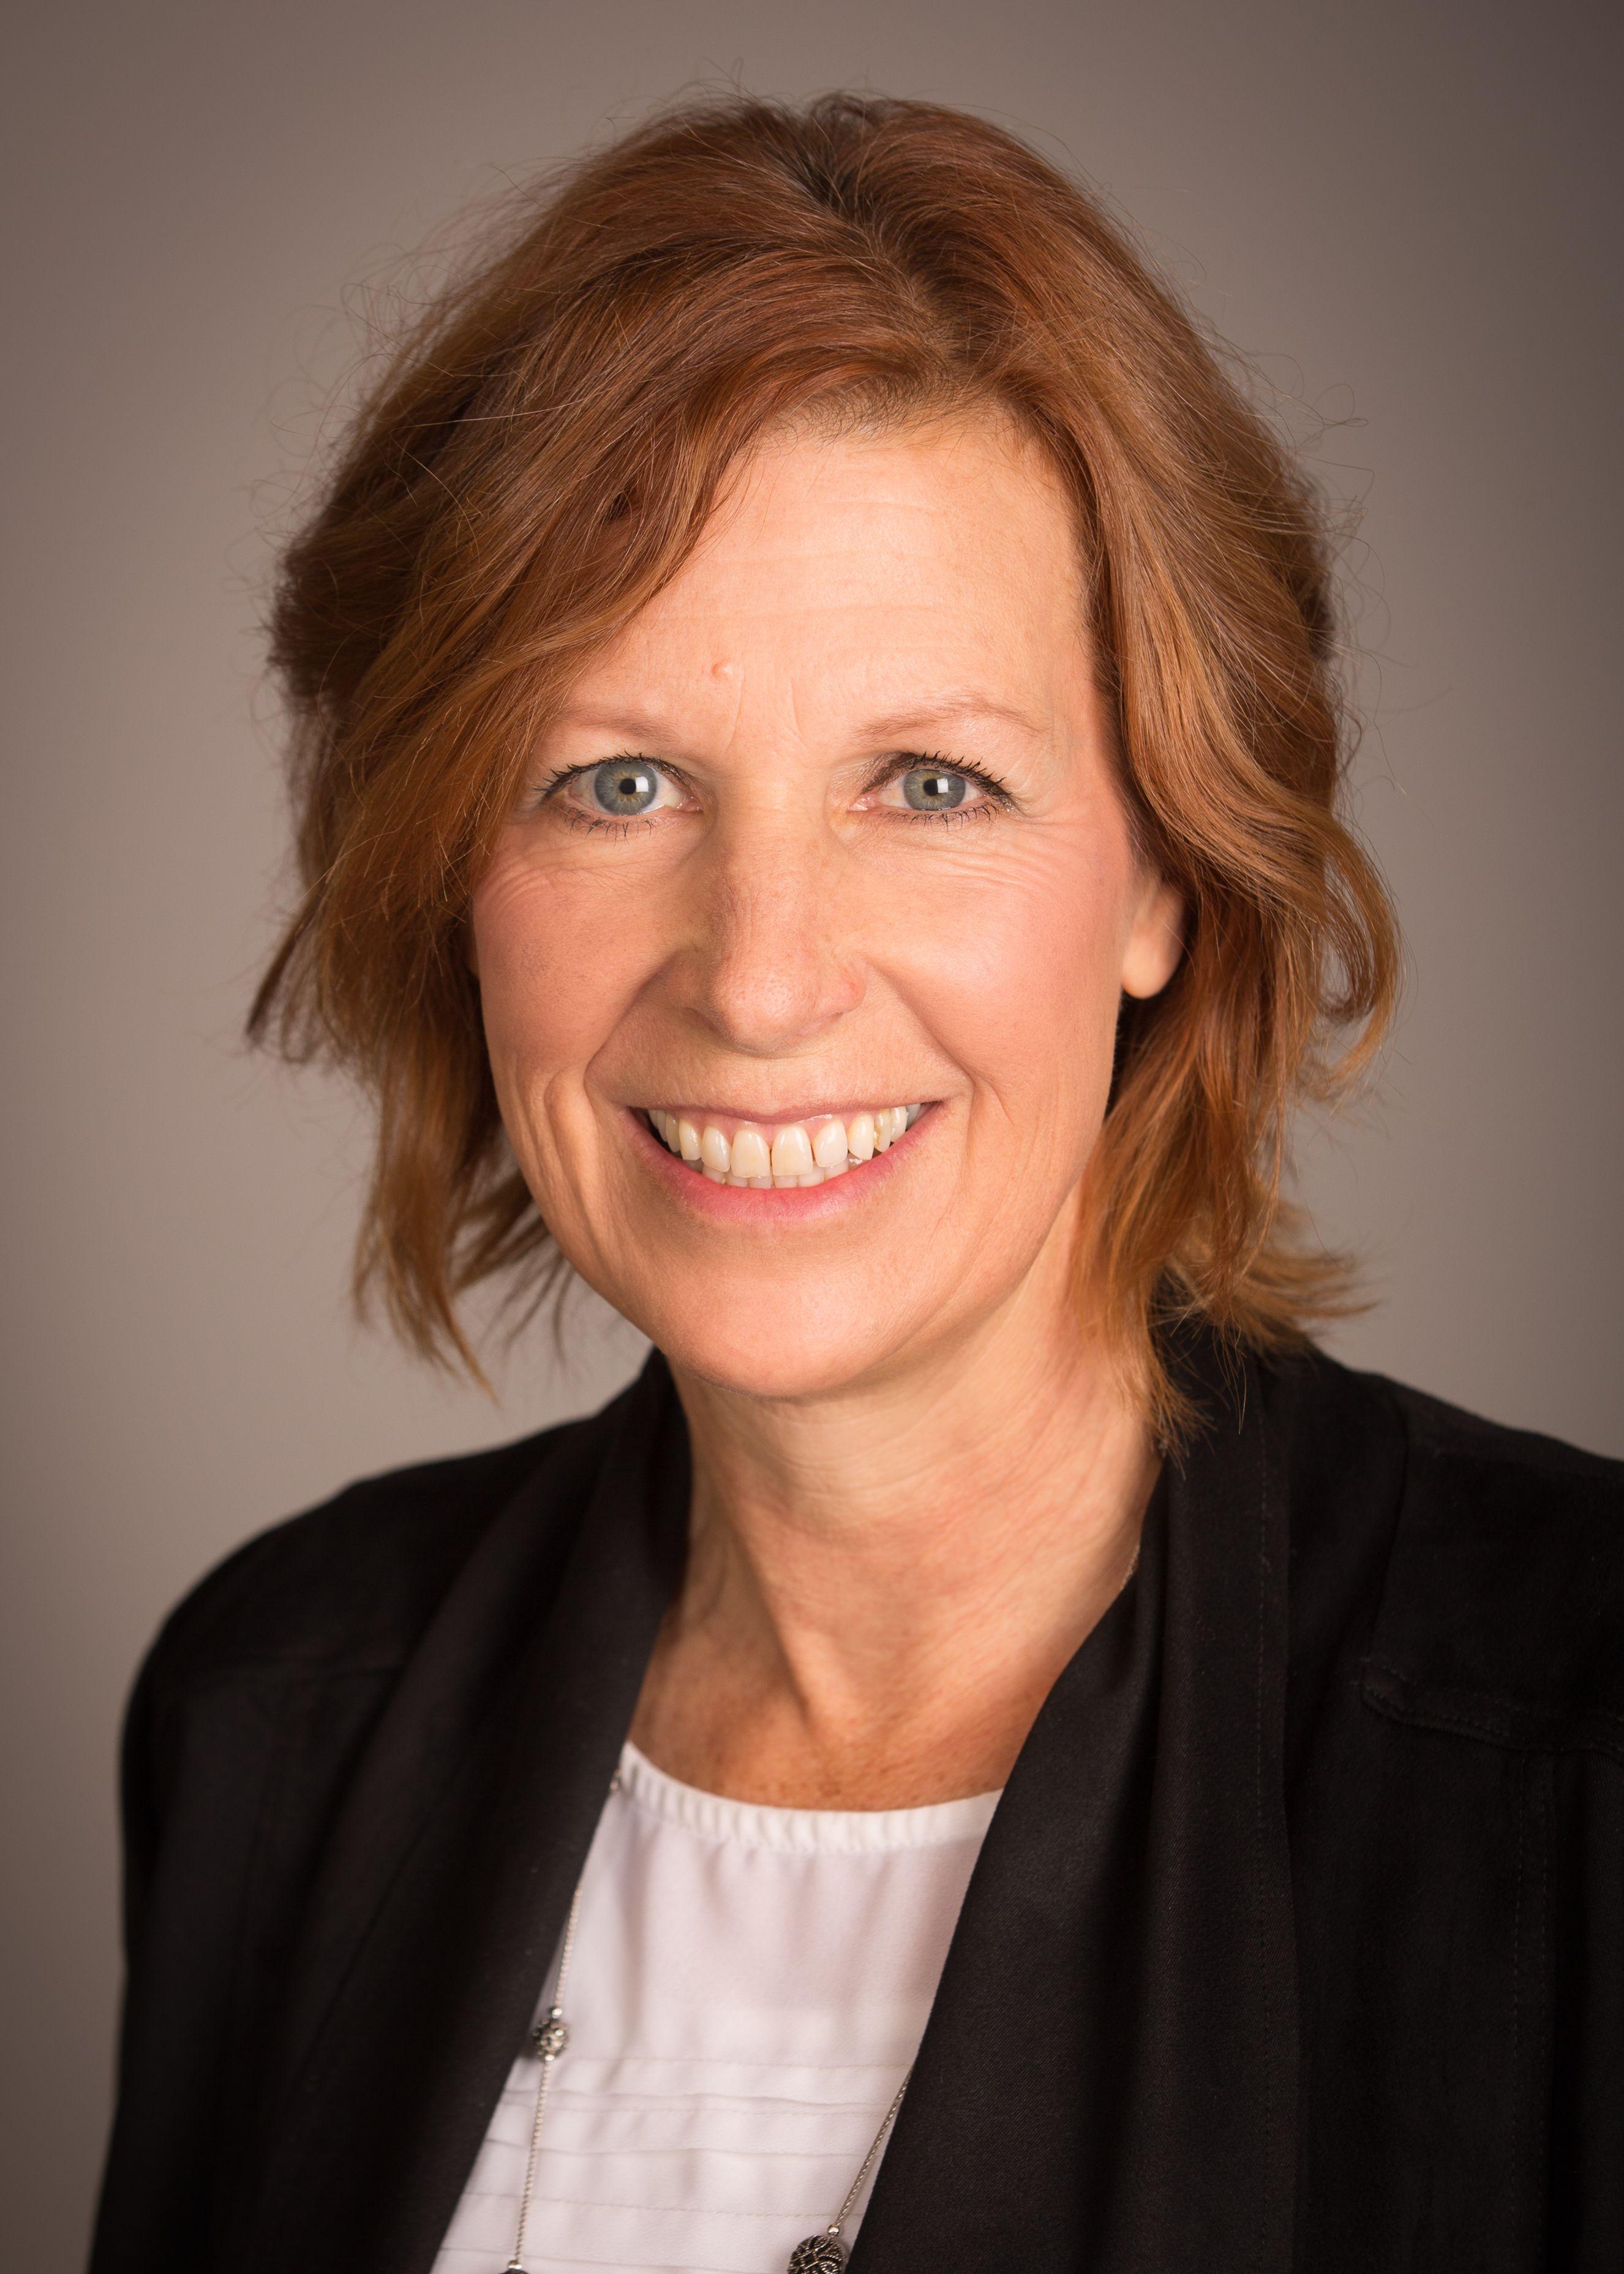 Tammy Sheahan